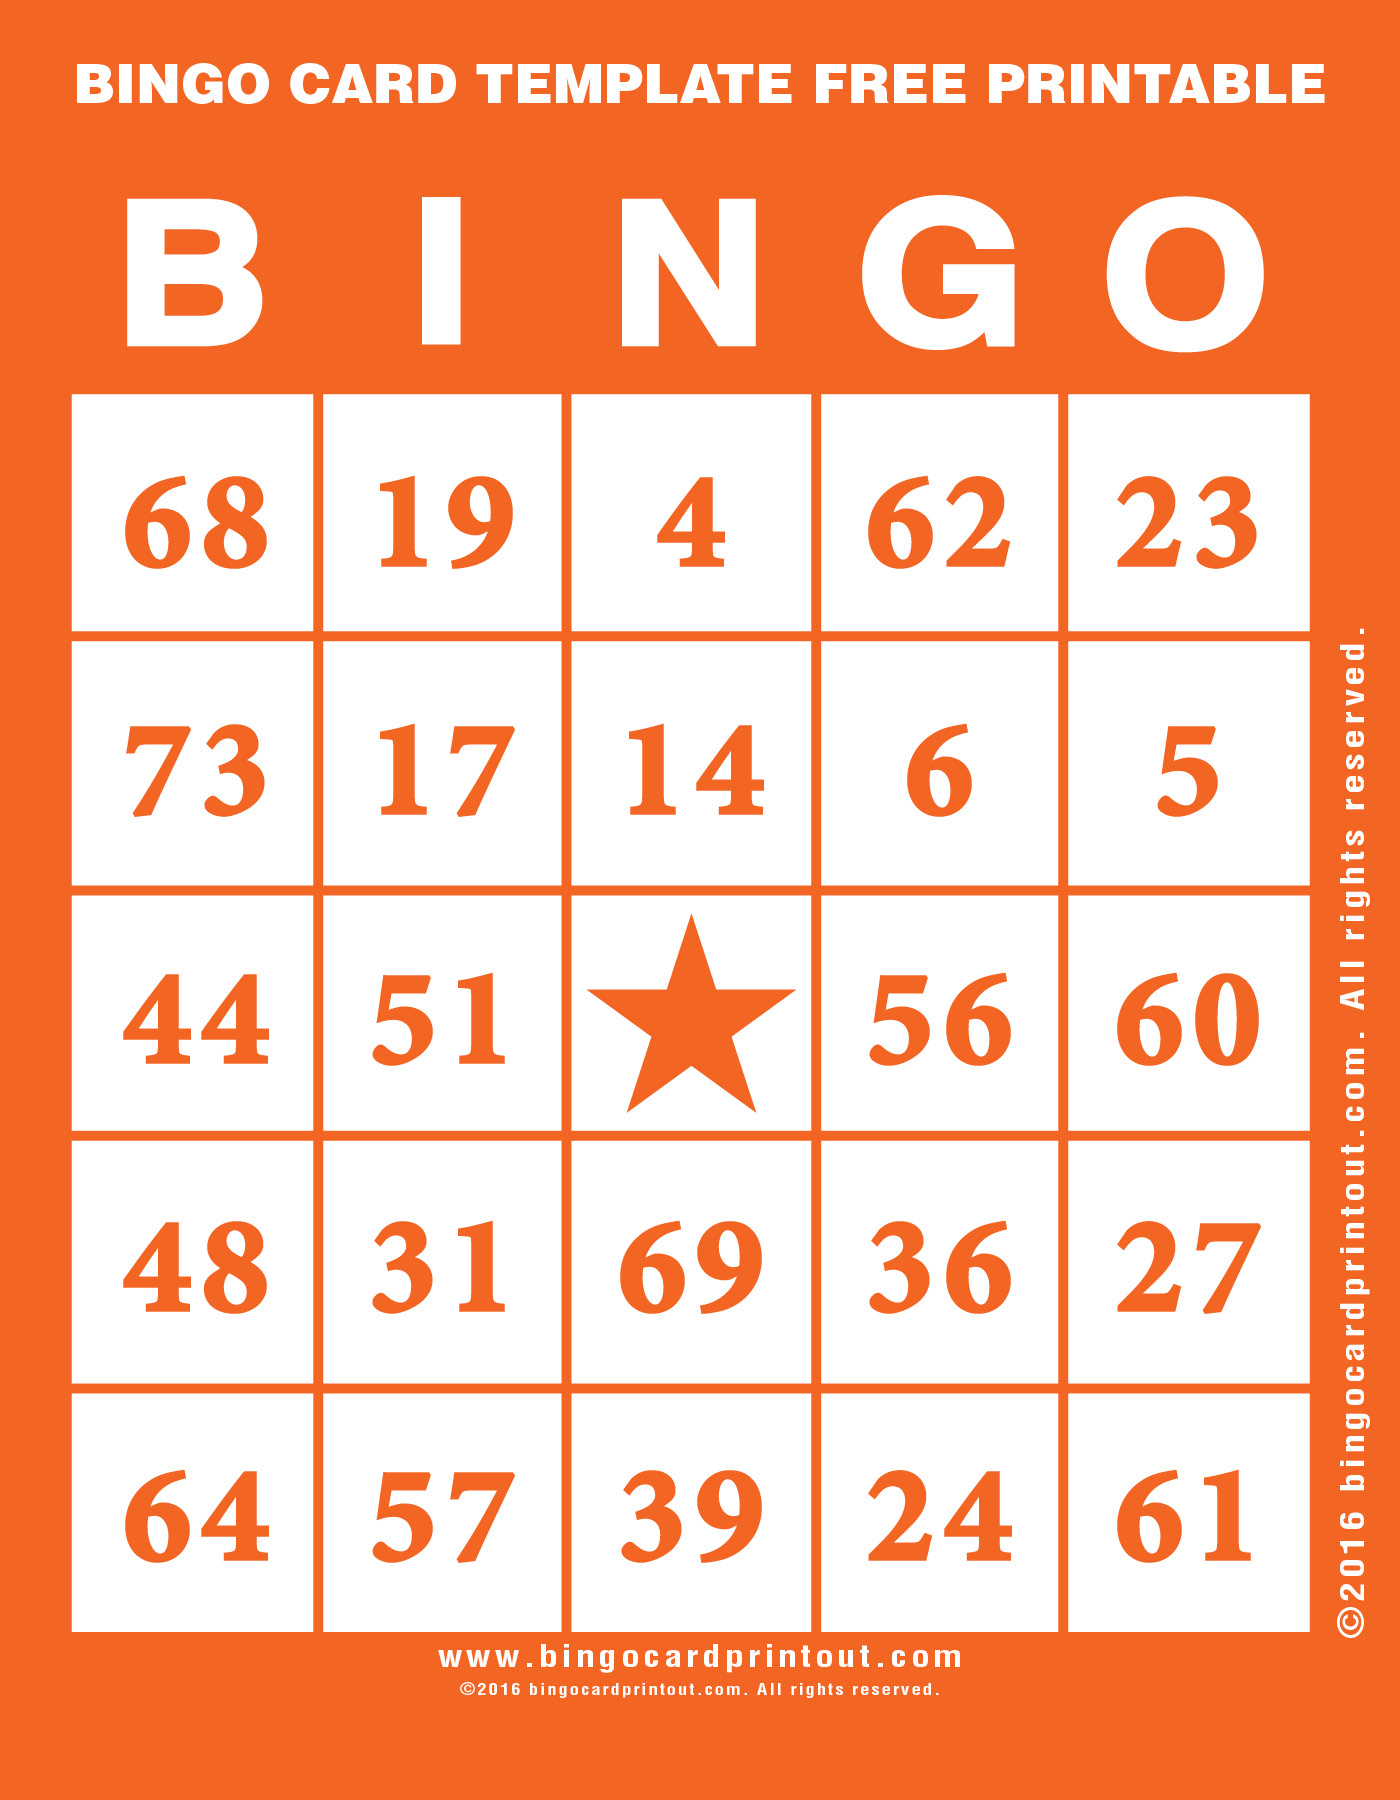 Bingo Card Template Free Printable - Bingocardprintout - Free Printable Bingo